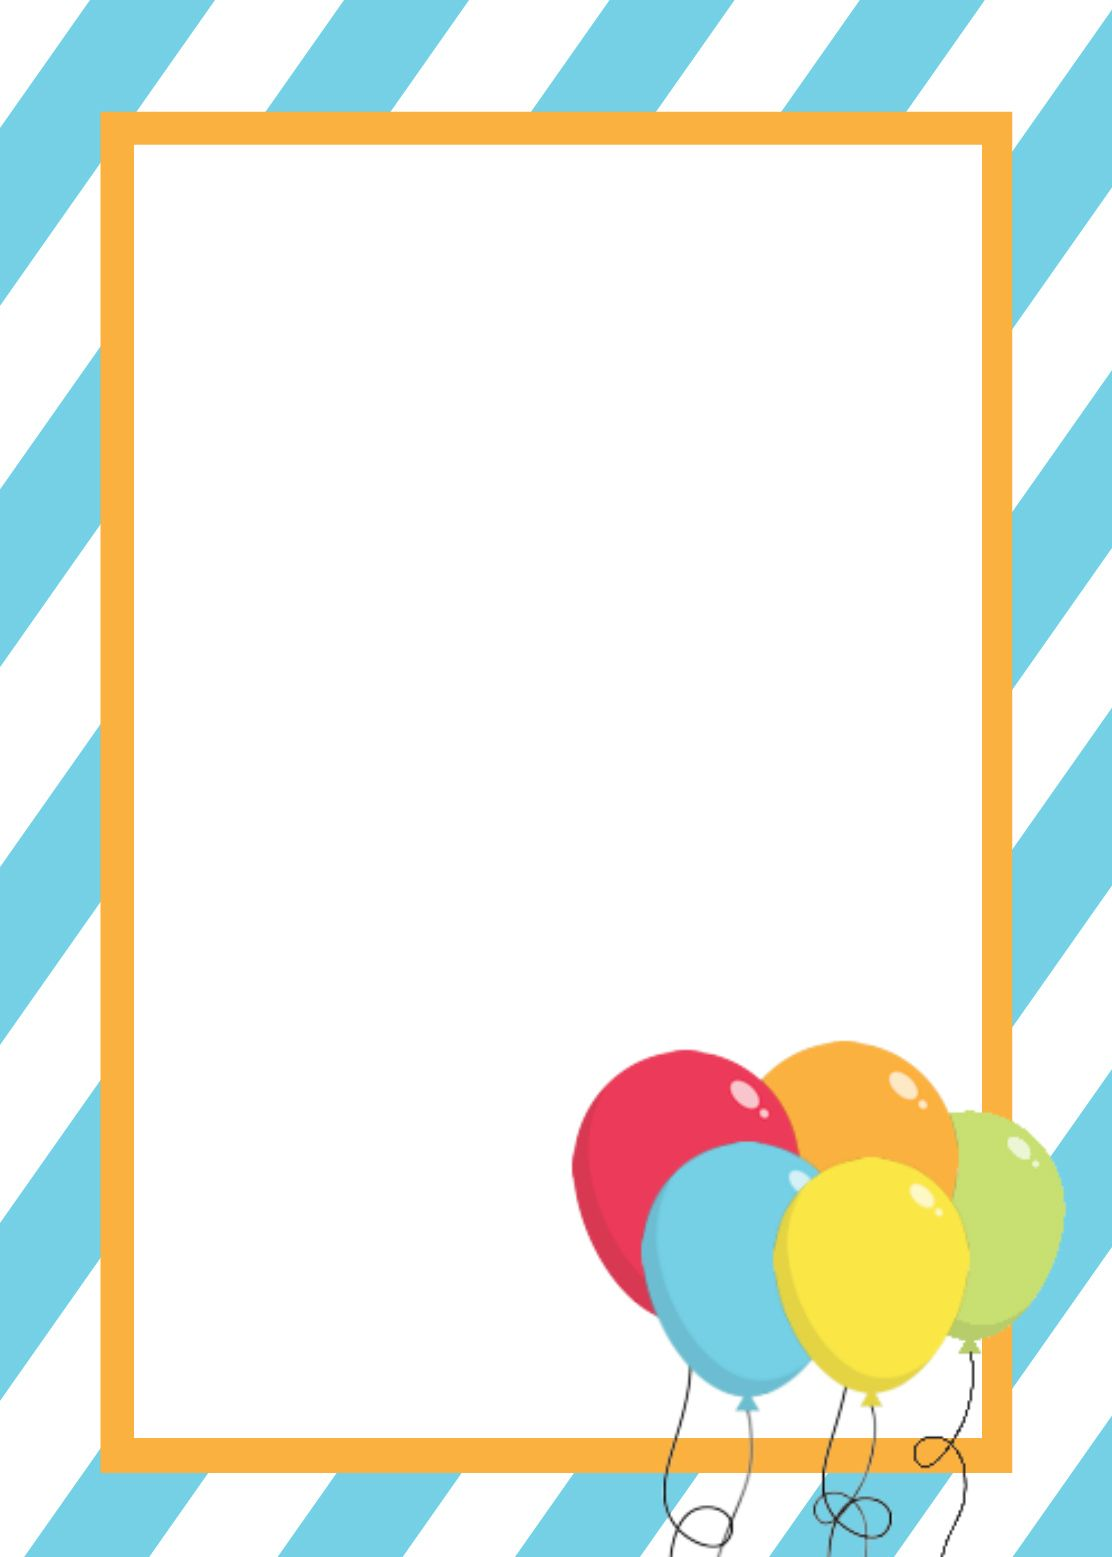 Free Printable Birthday Invitation Templates Birthday Party Invitation Templates Printable Birthday Invitations Free Party Invitation Templates